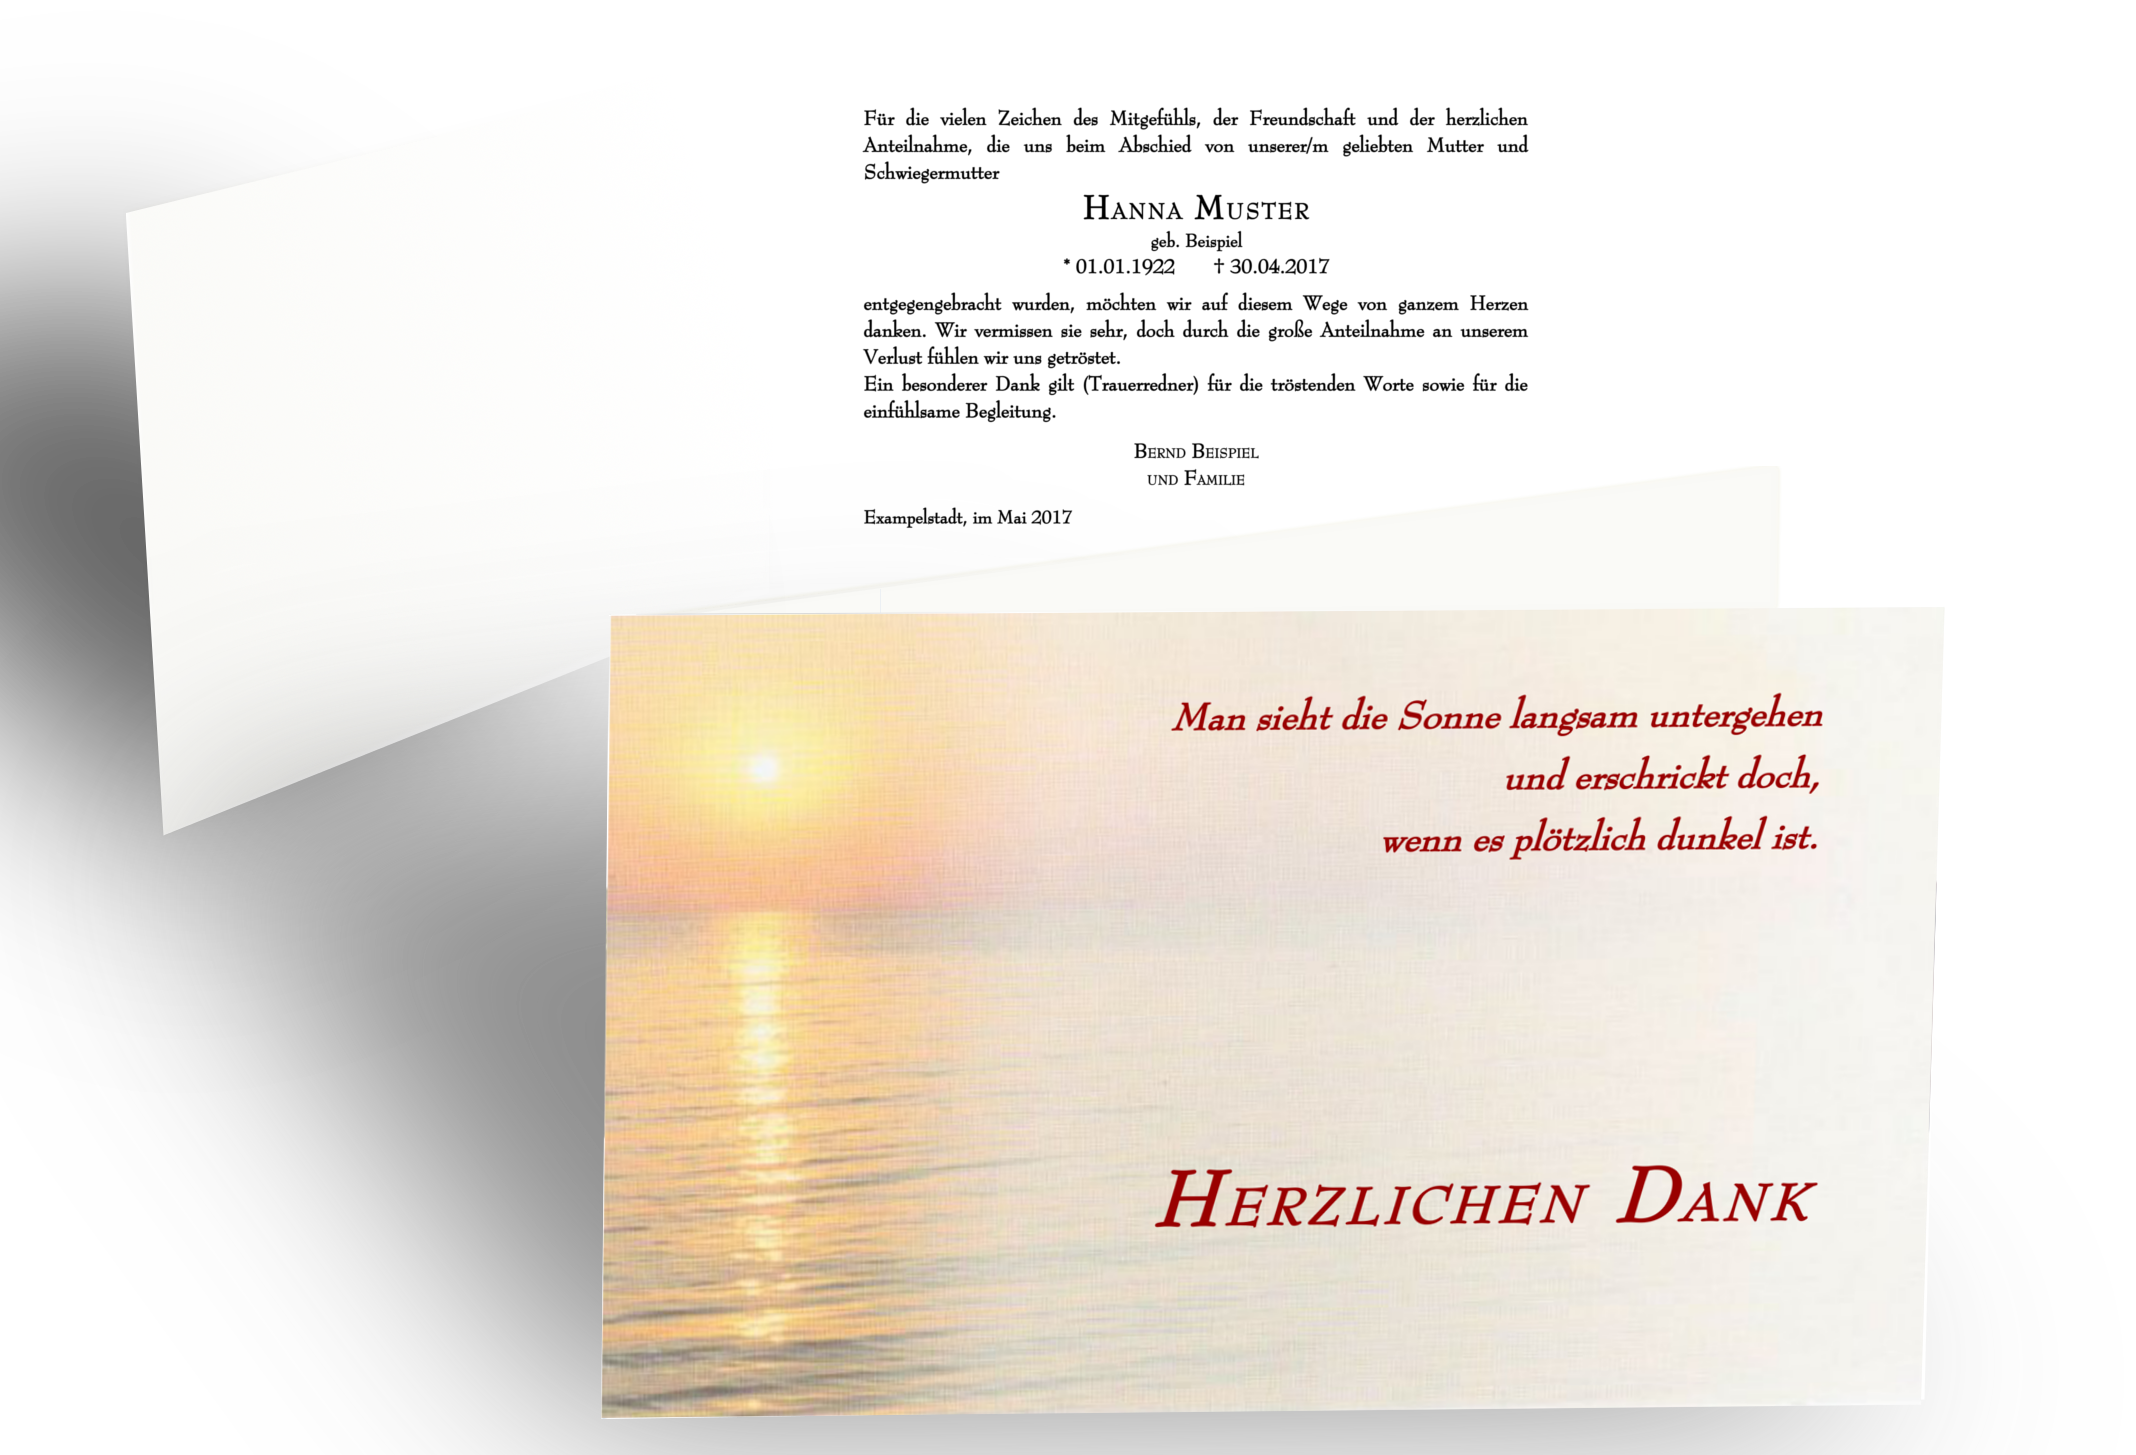 Dankeskarte Beerdigung Sonnenuntergang Trauer Klappkarte Danksagung Text Trostende Worte Danke Sagen